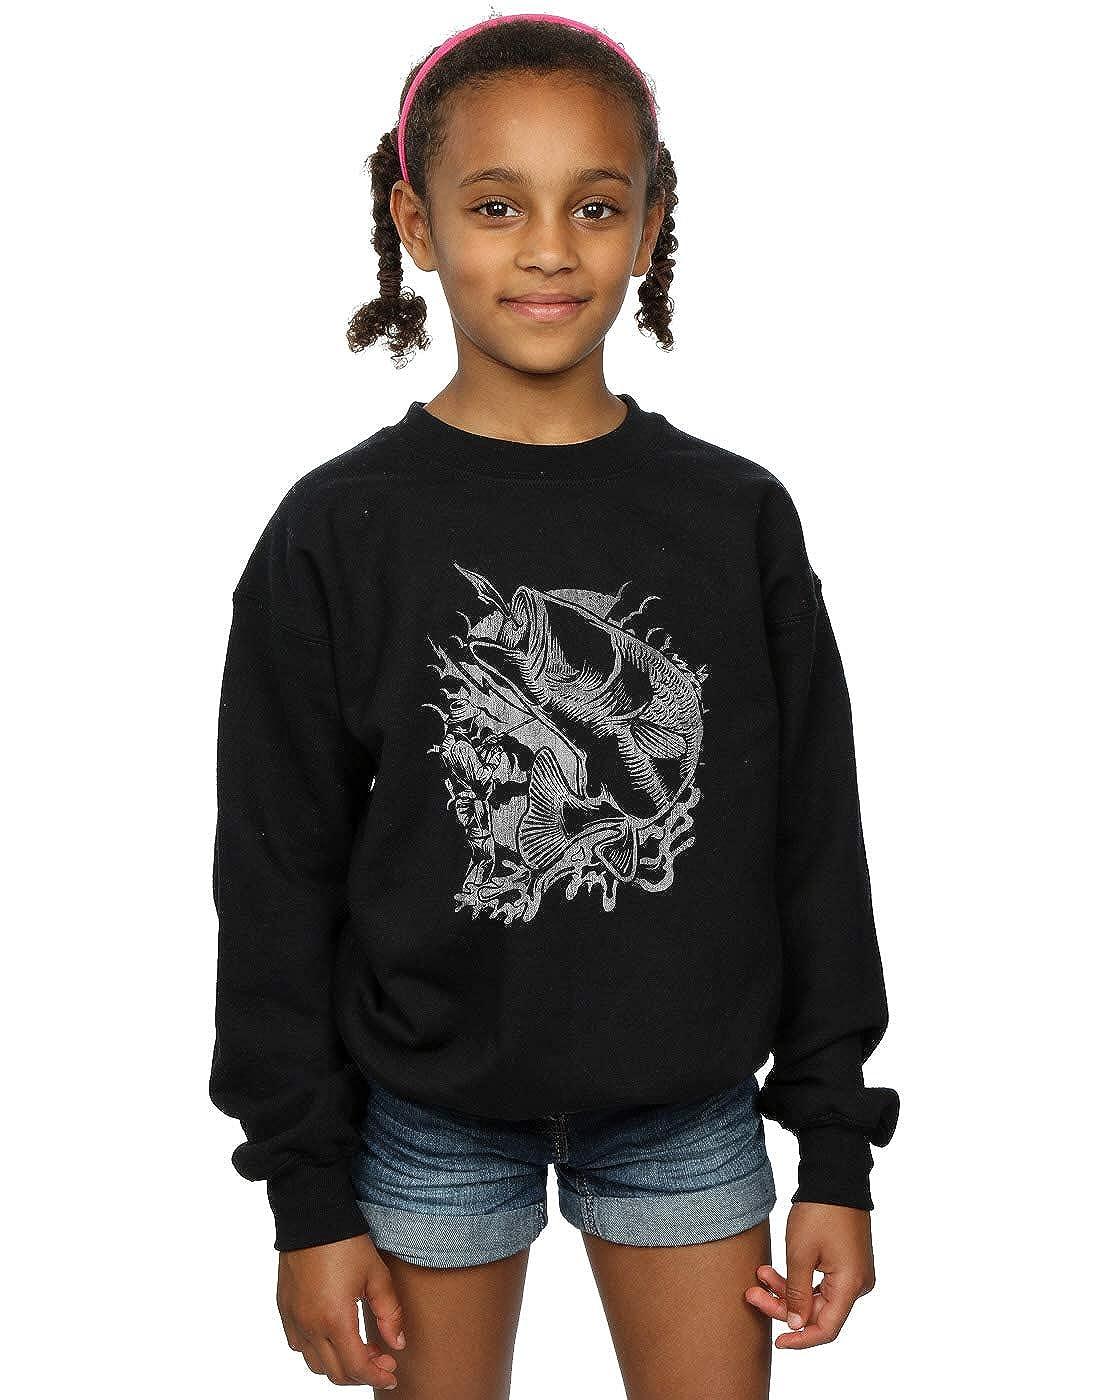 Absolute Cult Drewbacca Girls Fishermans Catch Sweatshirt